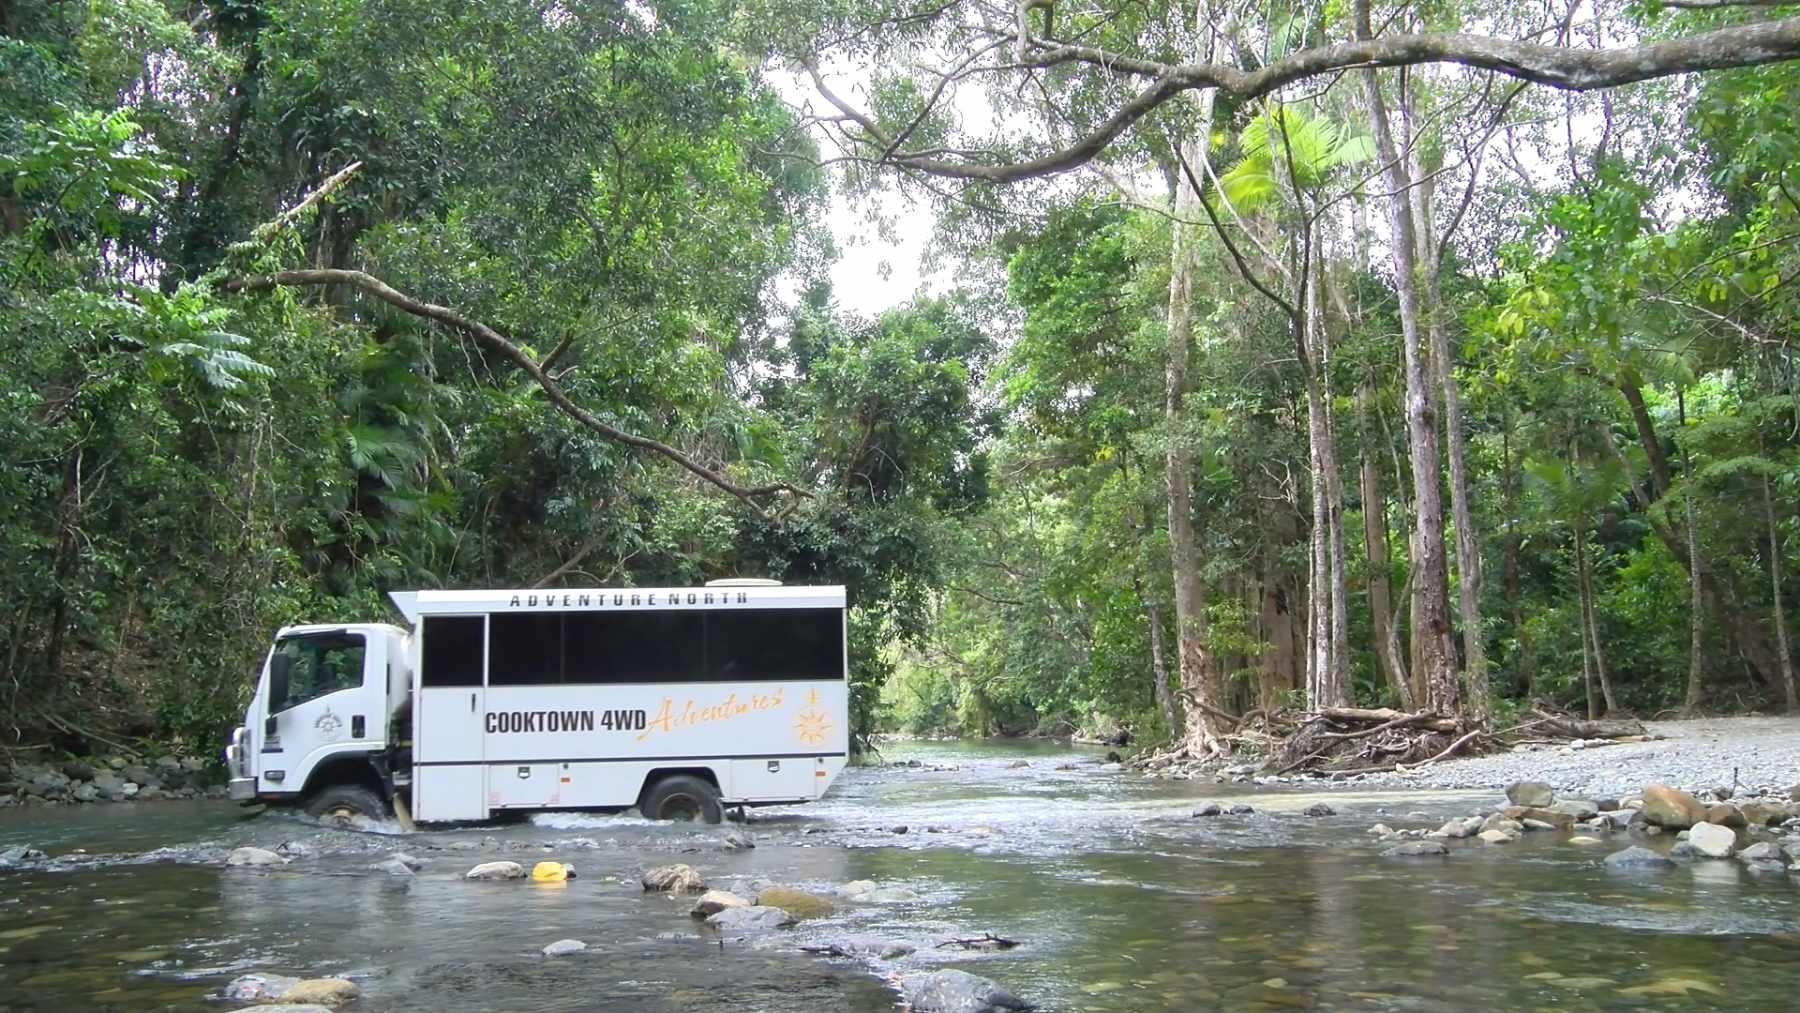 Cooktown Adventure Queensland QLD Australien